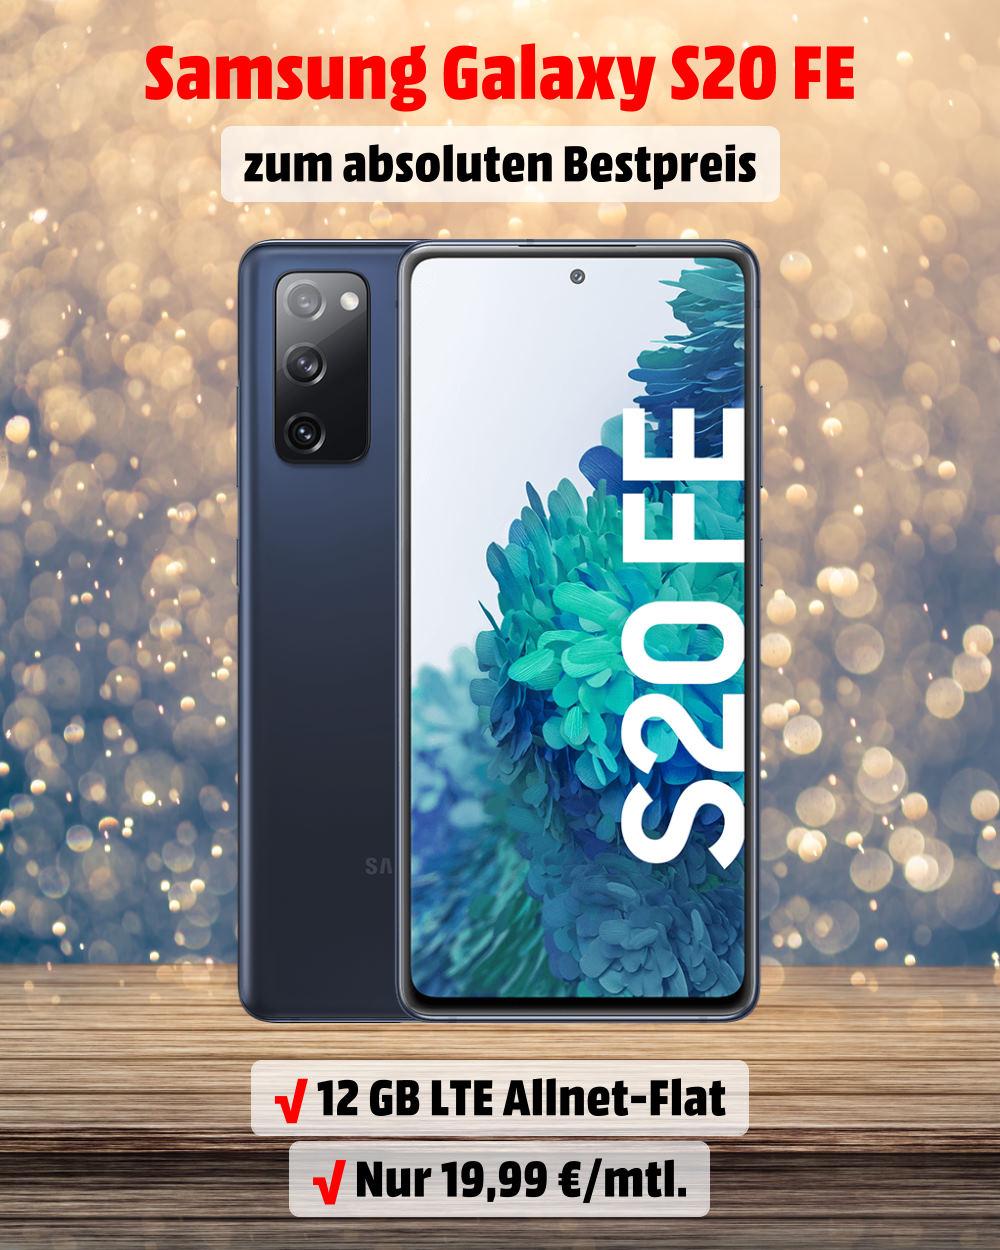 Galaxy S20 FE inklusive 12 GB LTE Allnet-Flat zum Bestpreis - Handy-Tarifvergleich